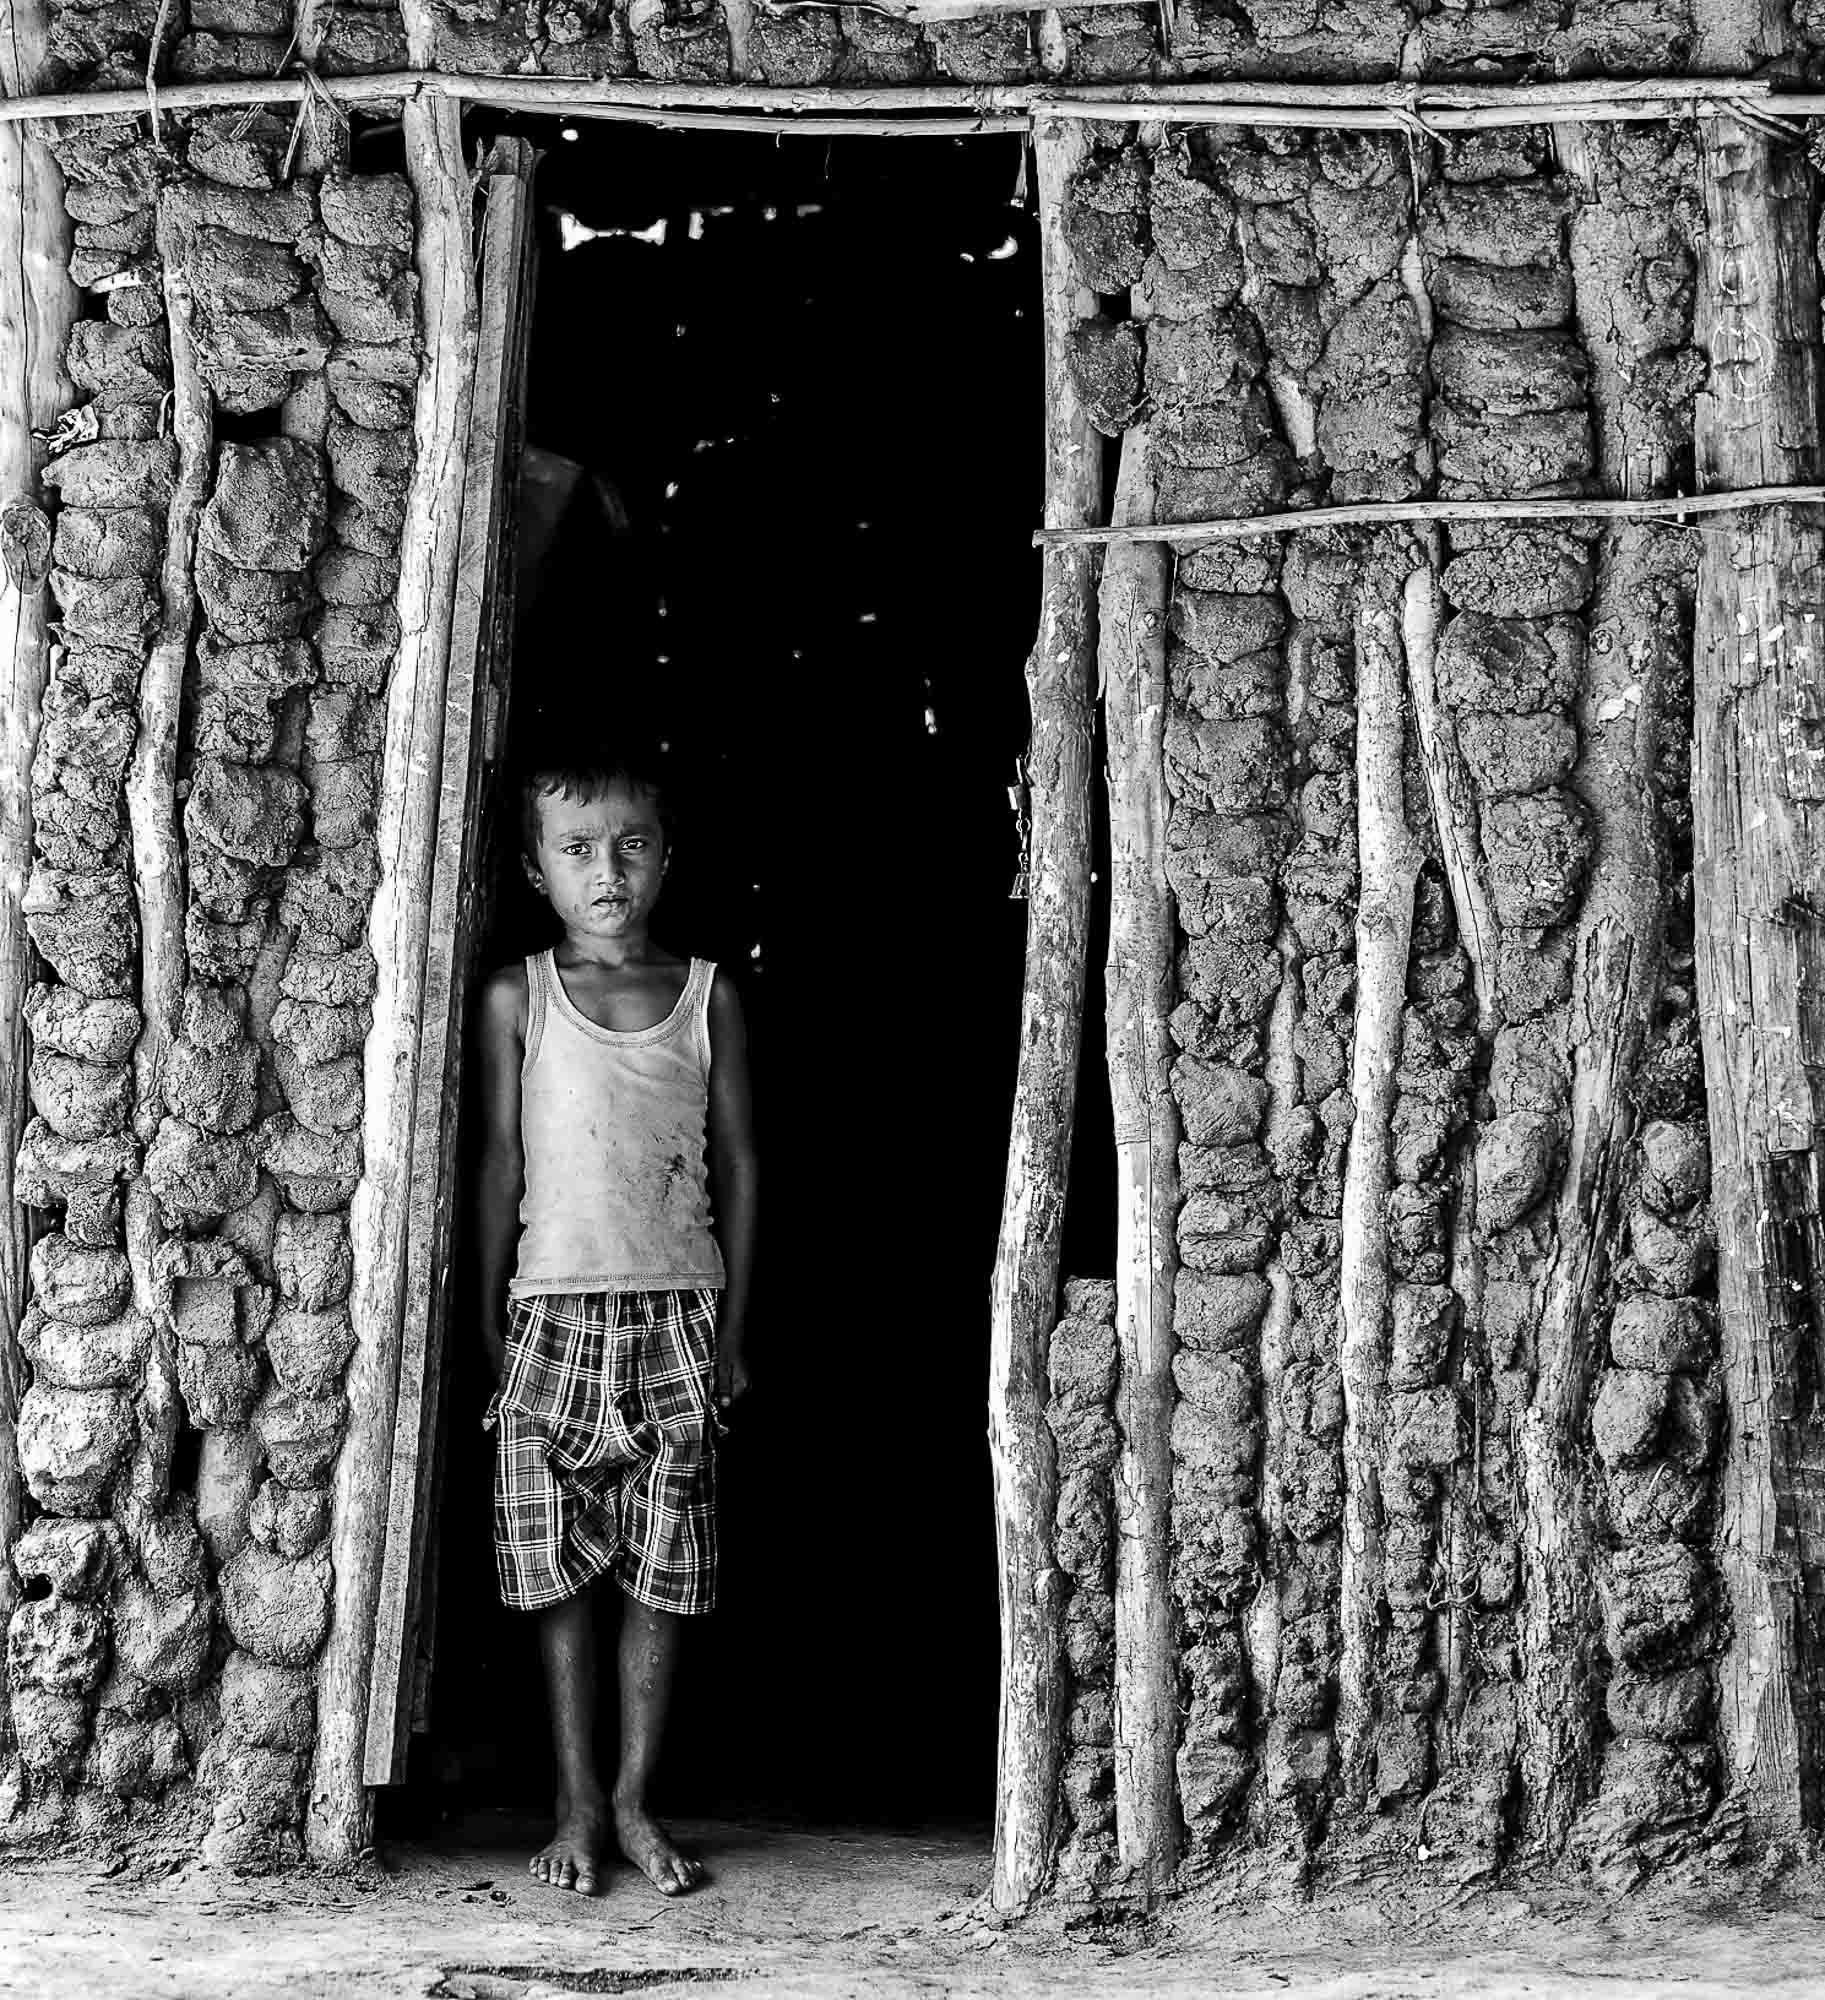 Vadda sri lanka indingenous group people photography - veddas little boy house photograph